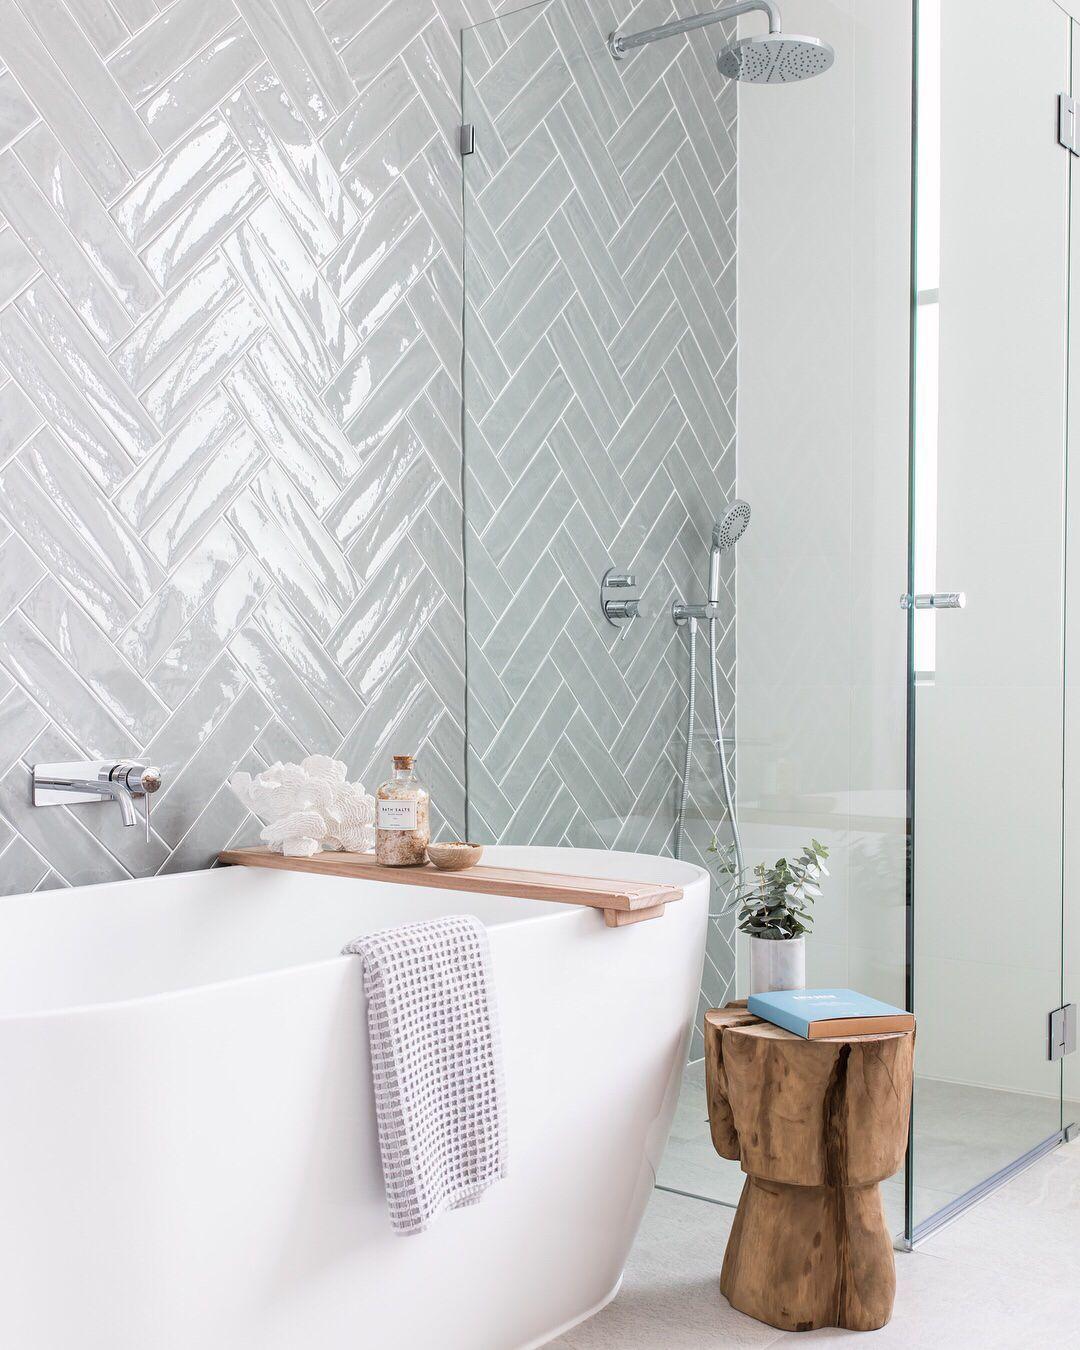 Minimalist Bathroom Wall Decor: 35 Minimalist Bathroom Design Ideas For Modern Home Decor